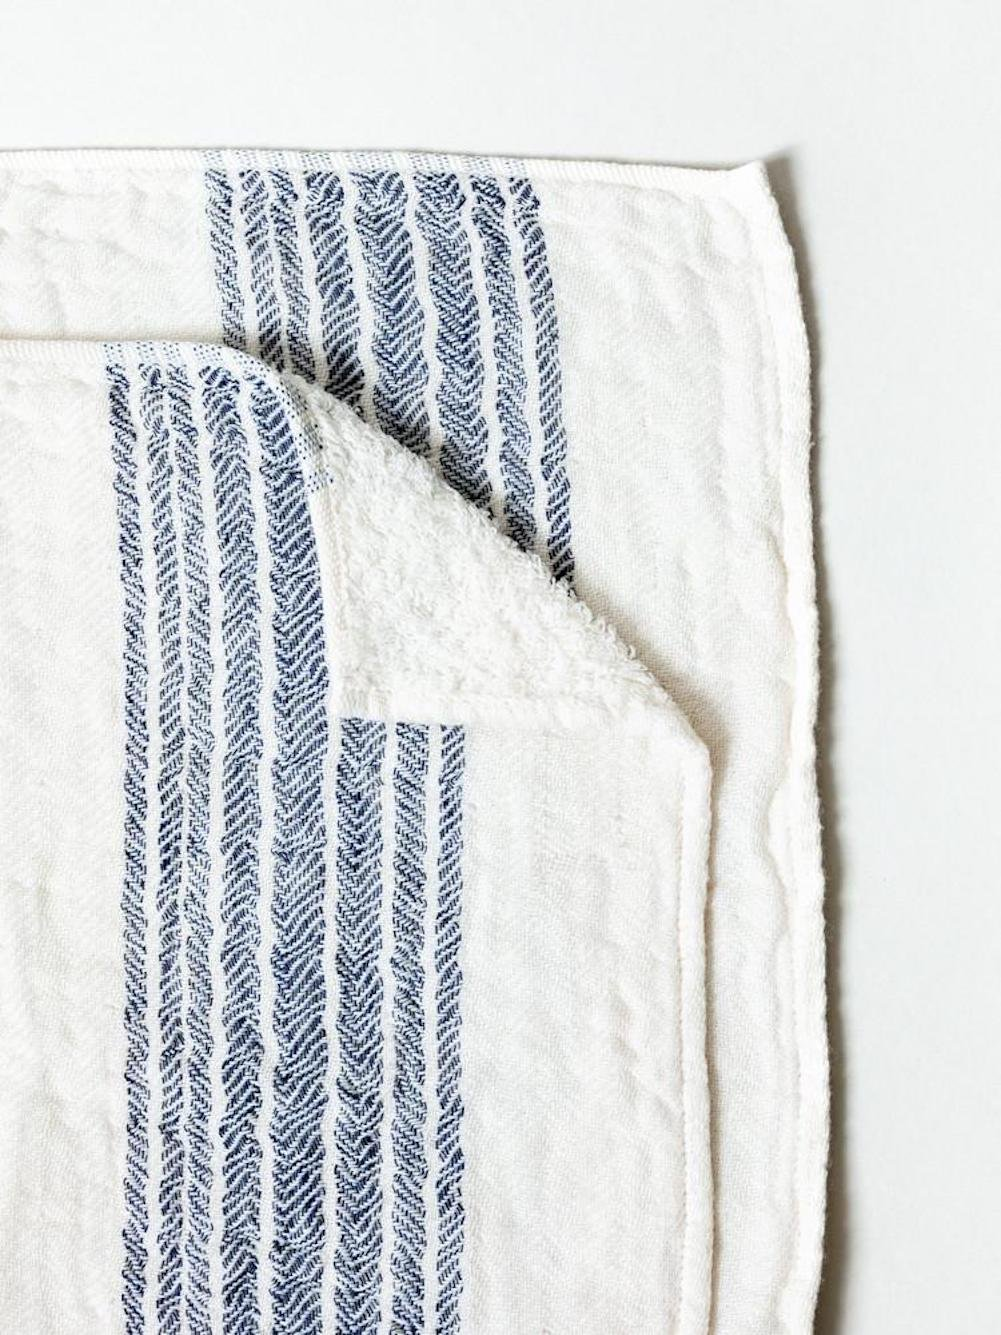 Kontex Organic Cotton Towels From Imabari, Japan - Navy (Set of 3 Towels) by Kontex (Image #2)